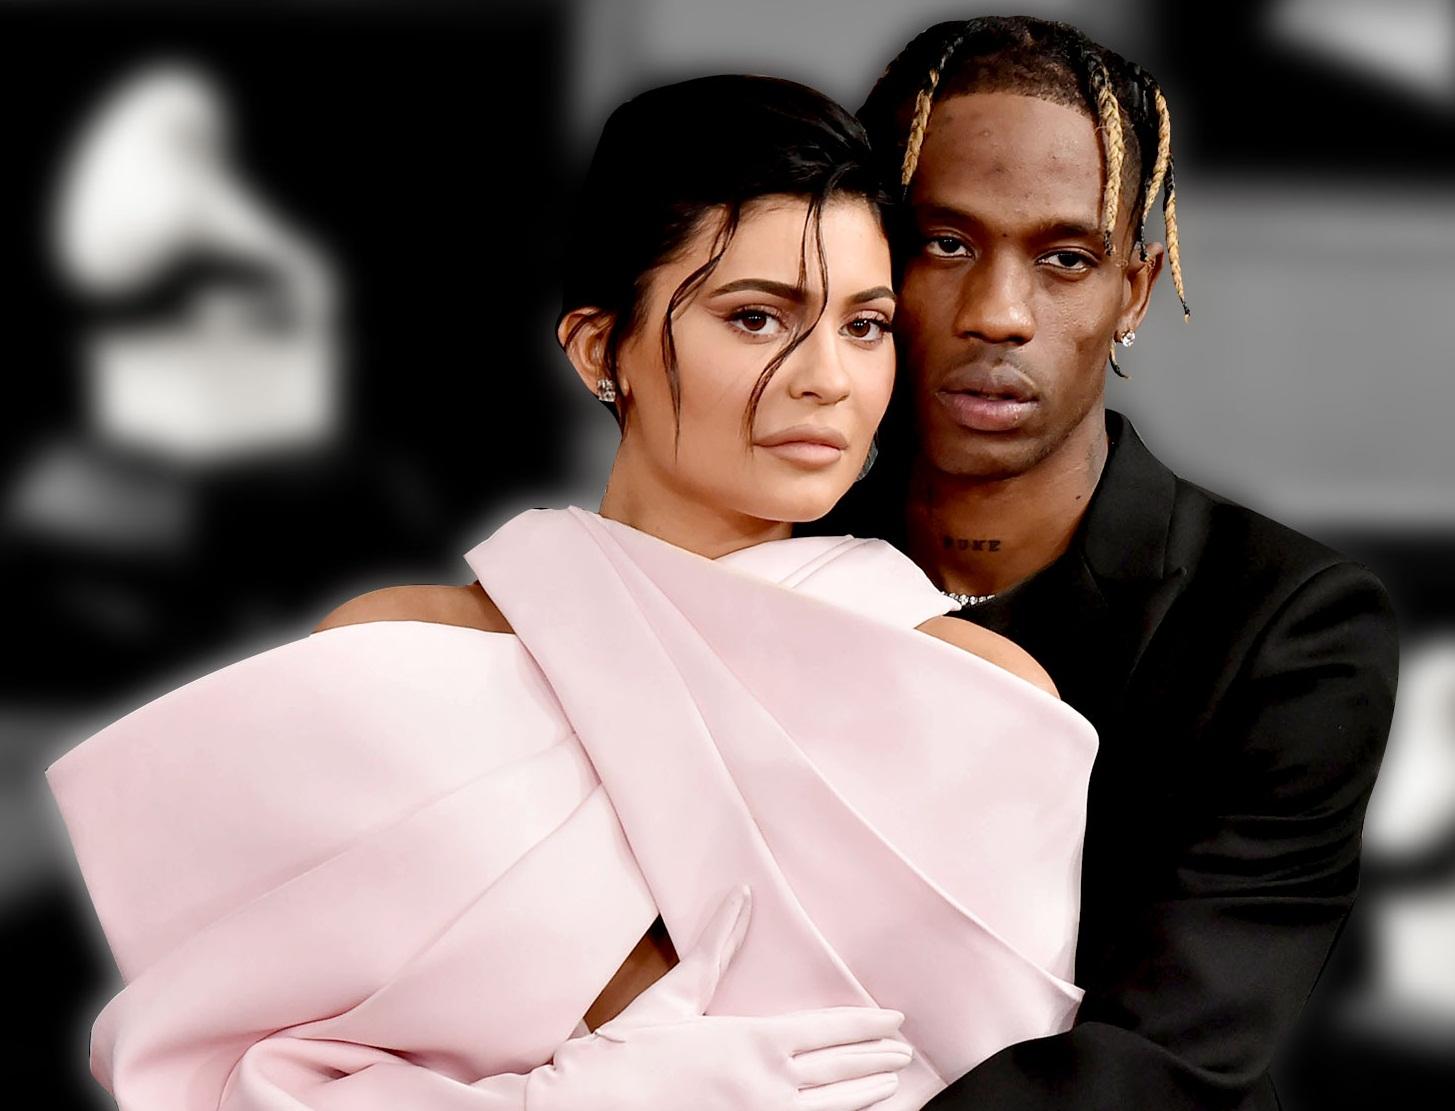 Why Kylie suspected Travis